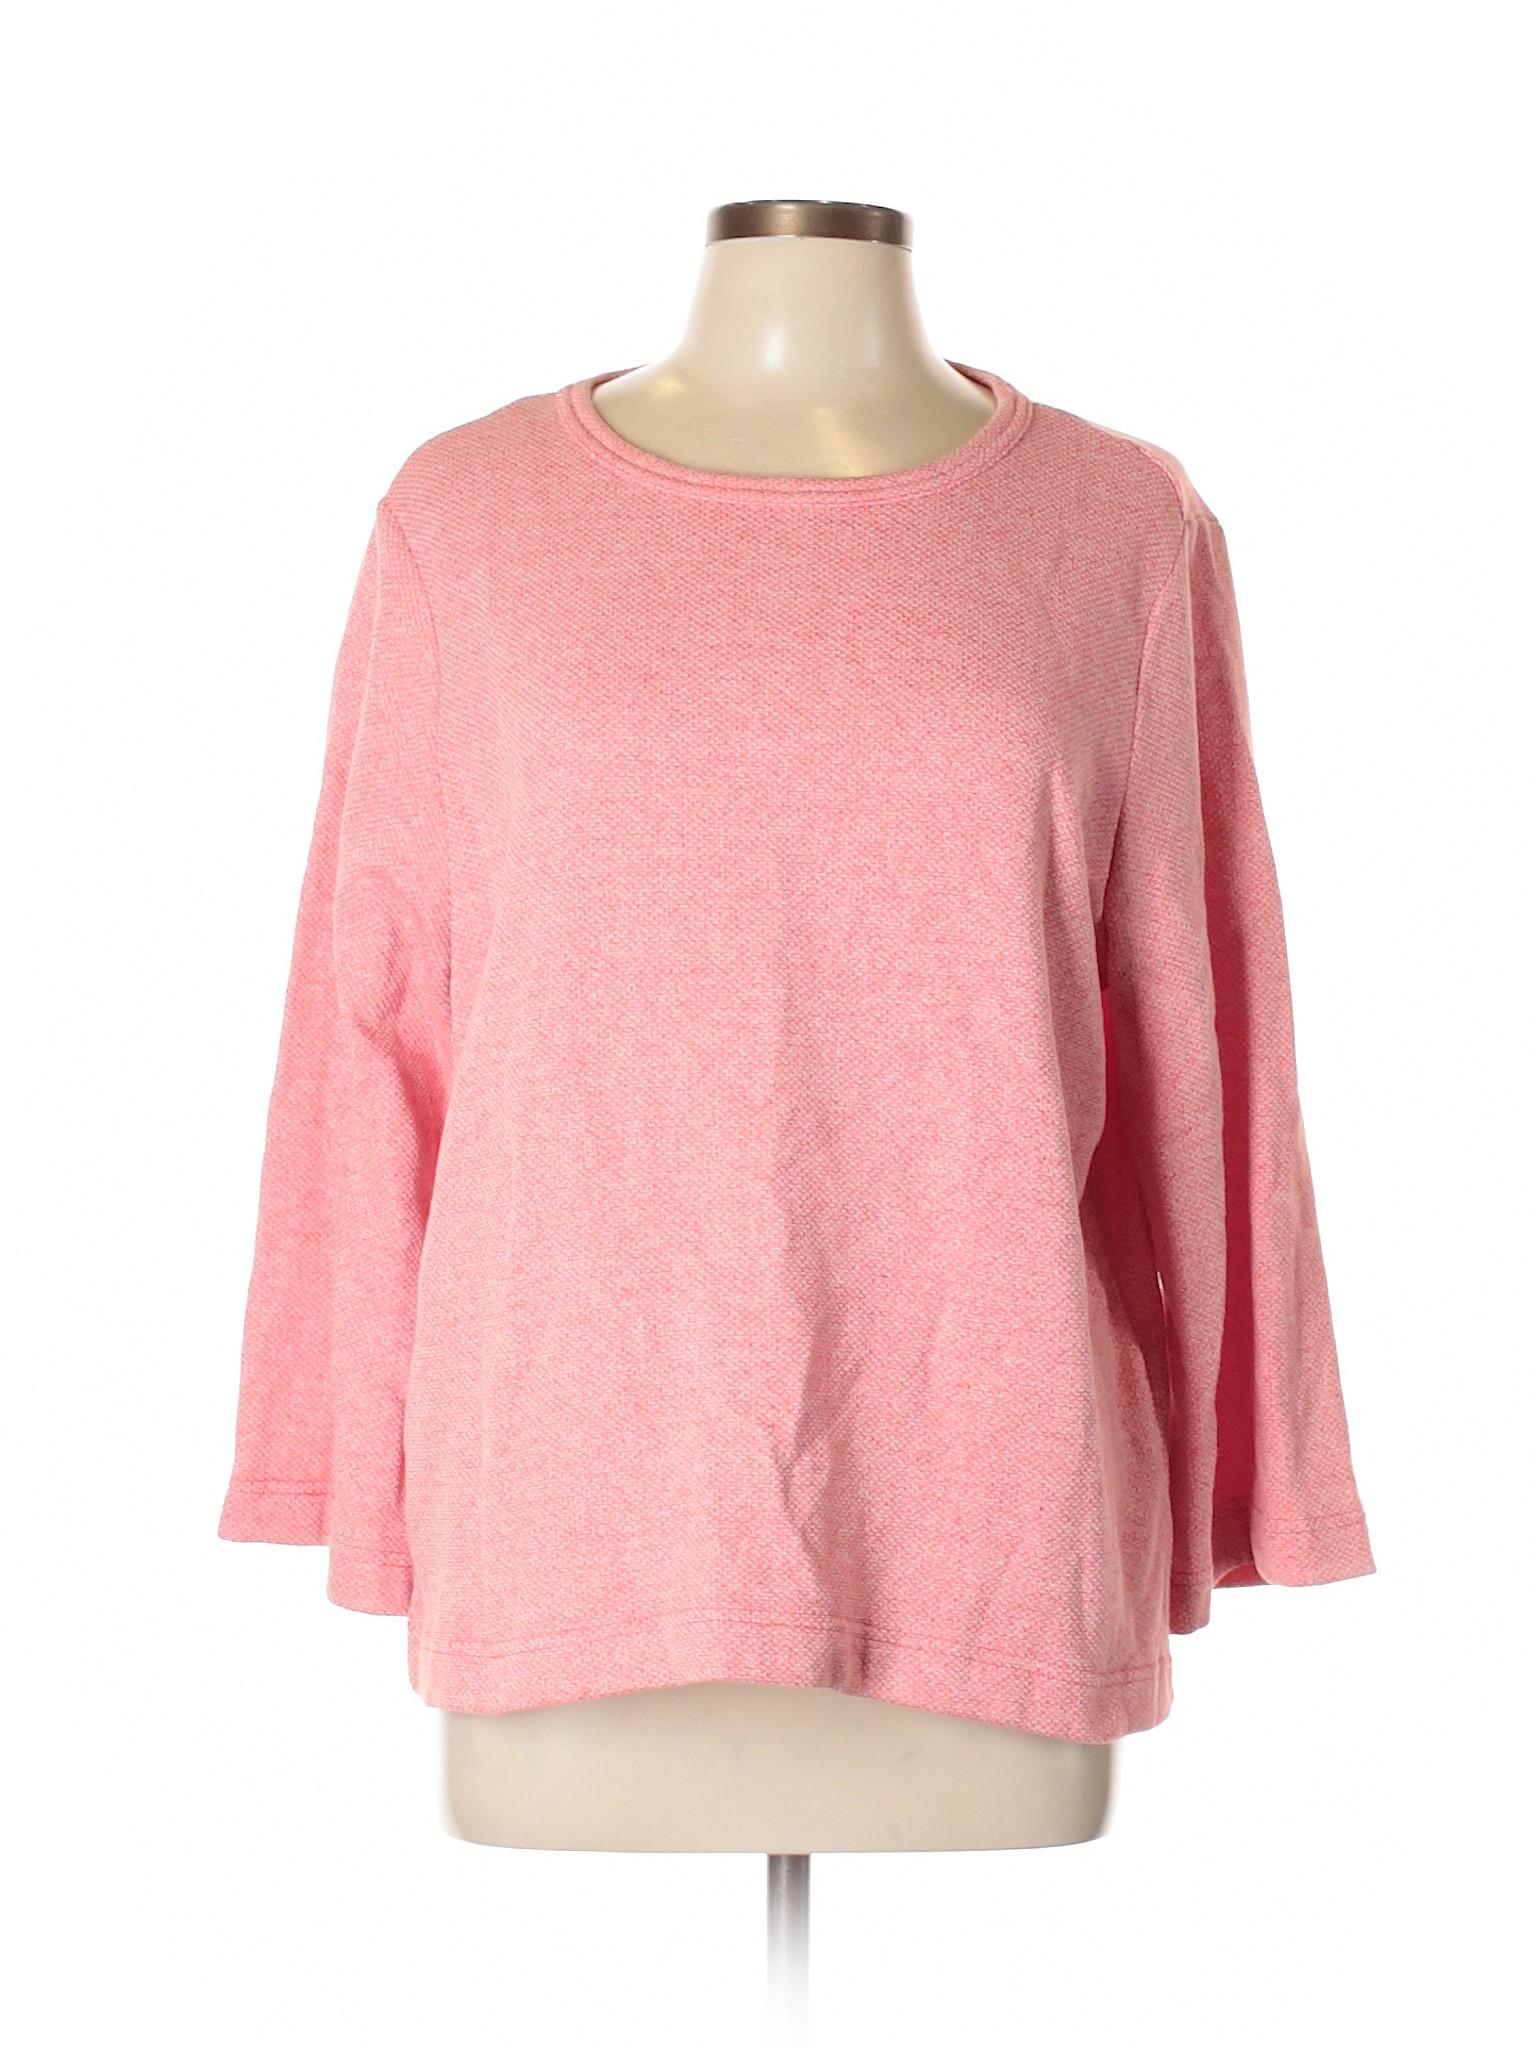 Pullover Lou amp; Grey Boutique Sweater dBxRtqtg